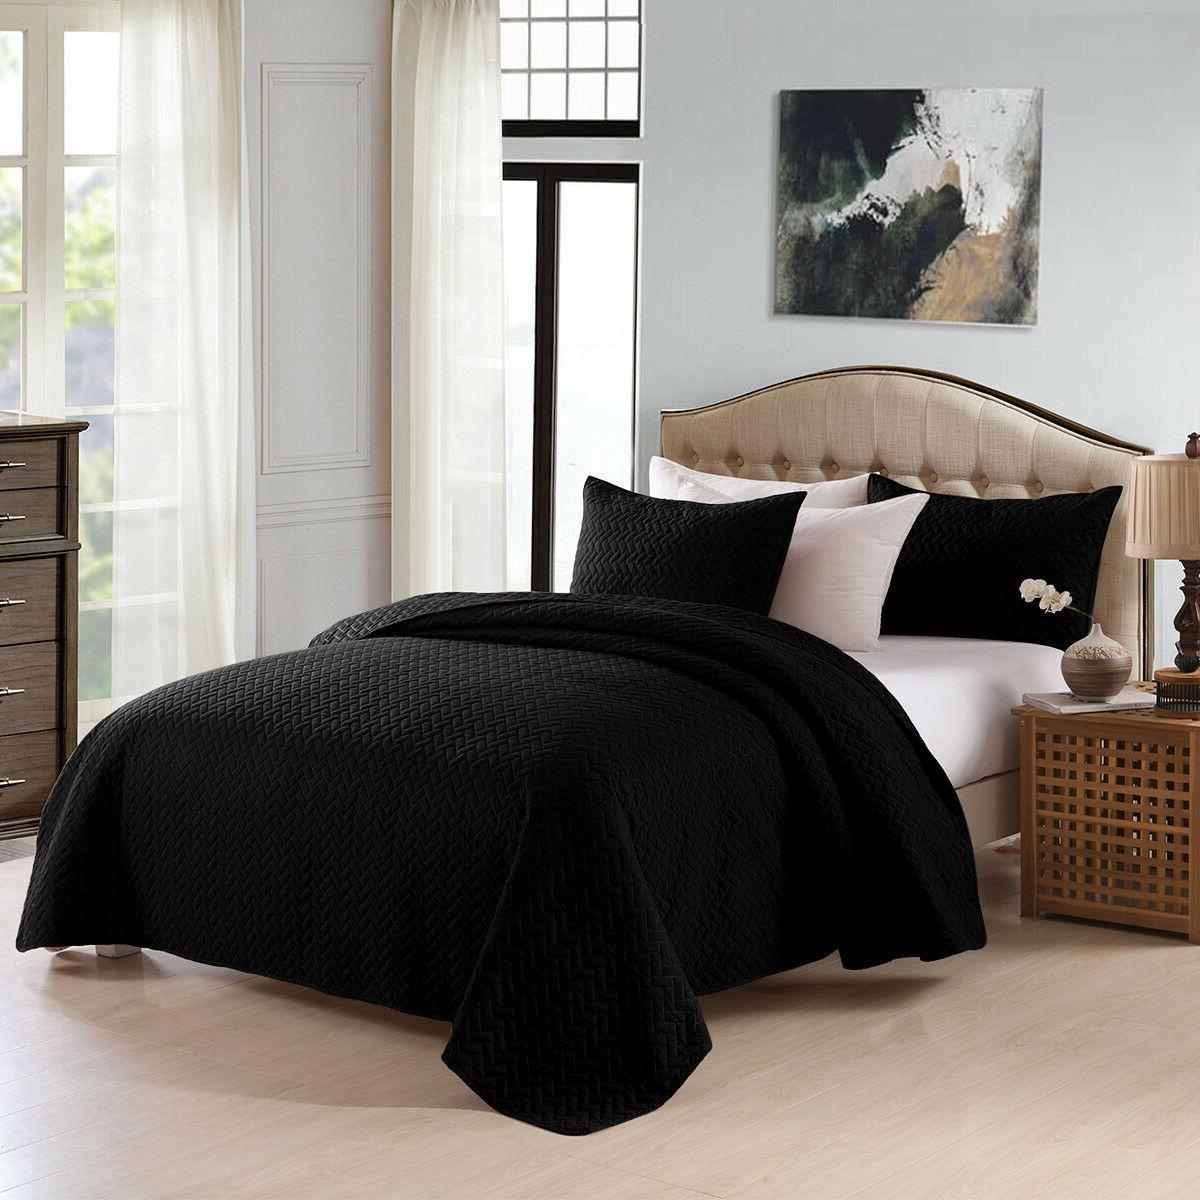 3-Piece Bedspread Quilt Set